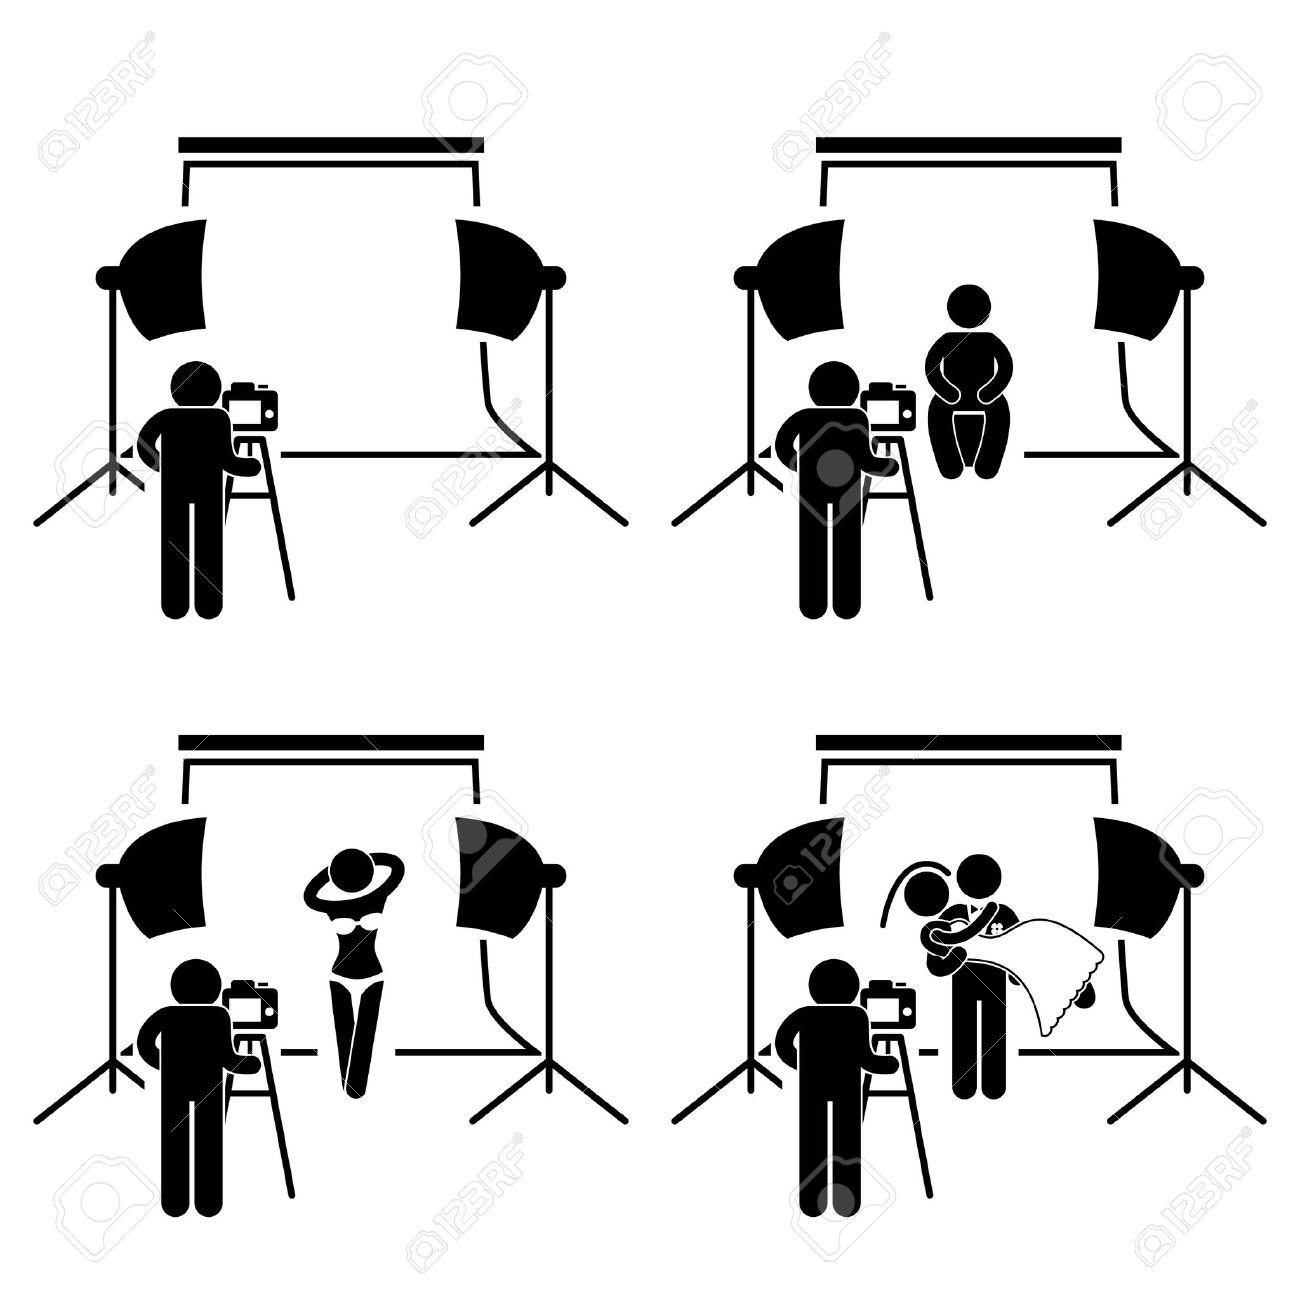 Photographer Studio Photography Shoot Stick Figure Pictogram Icon Stock Vector - 20283650